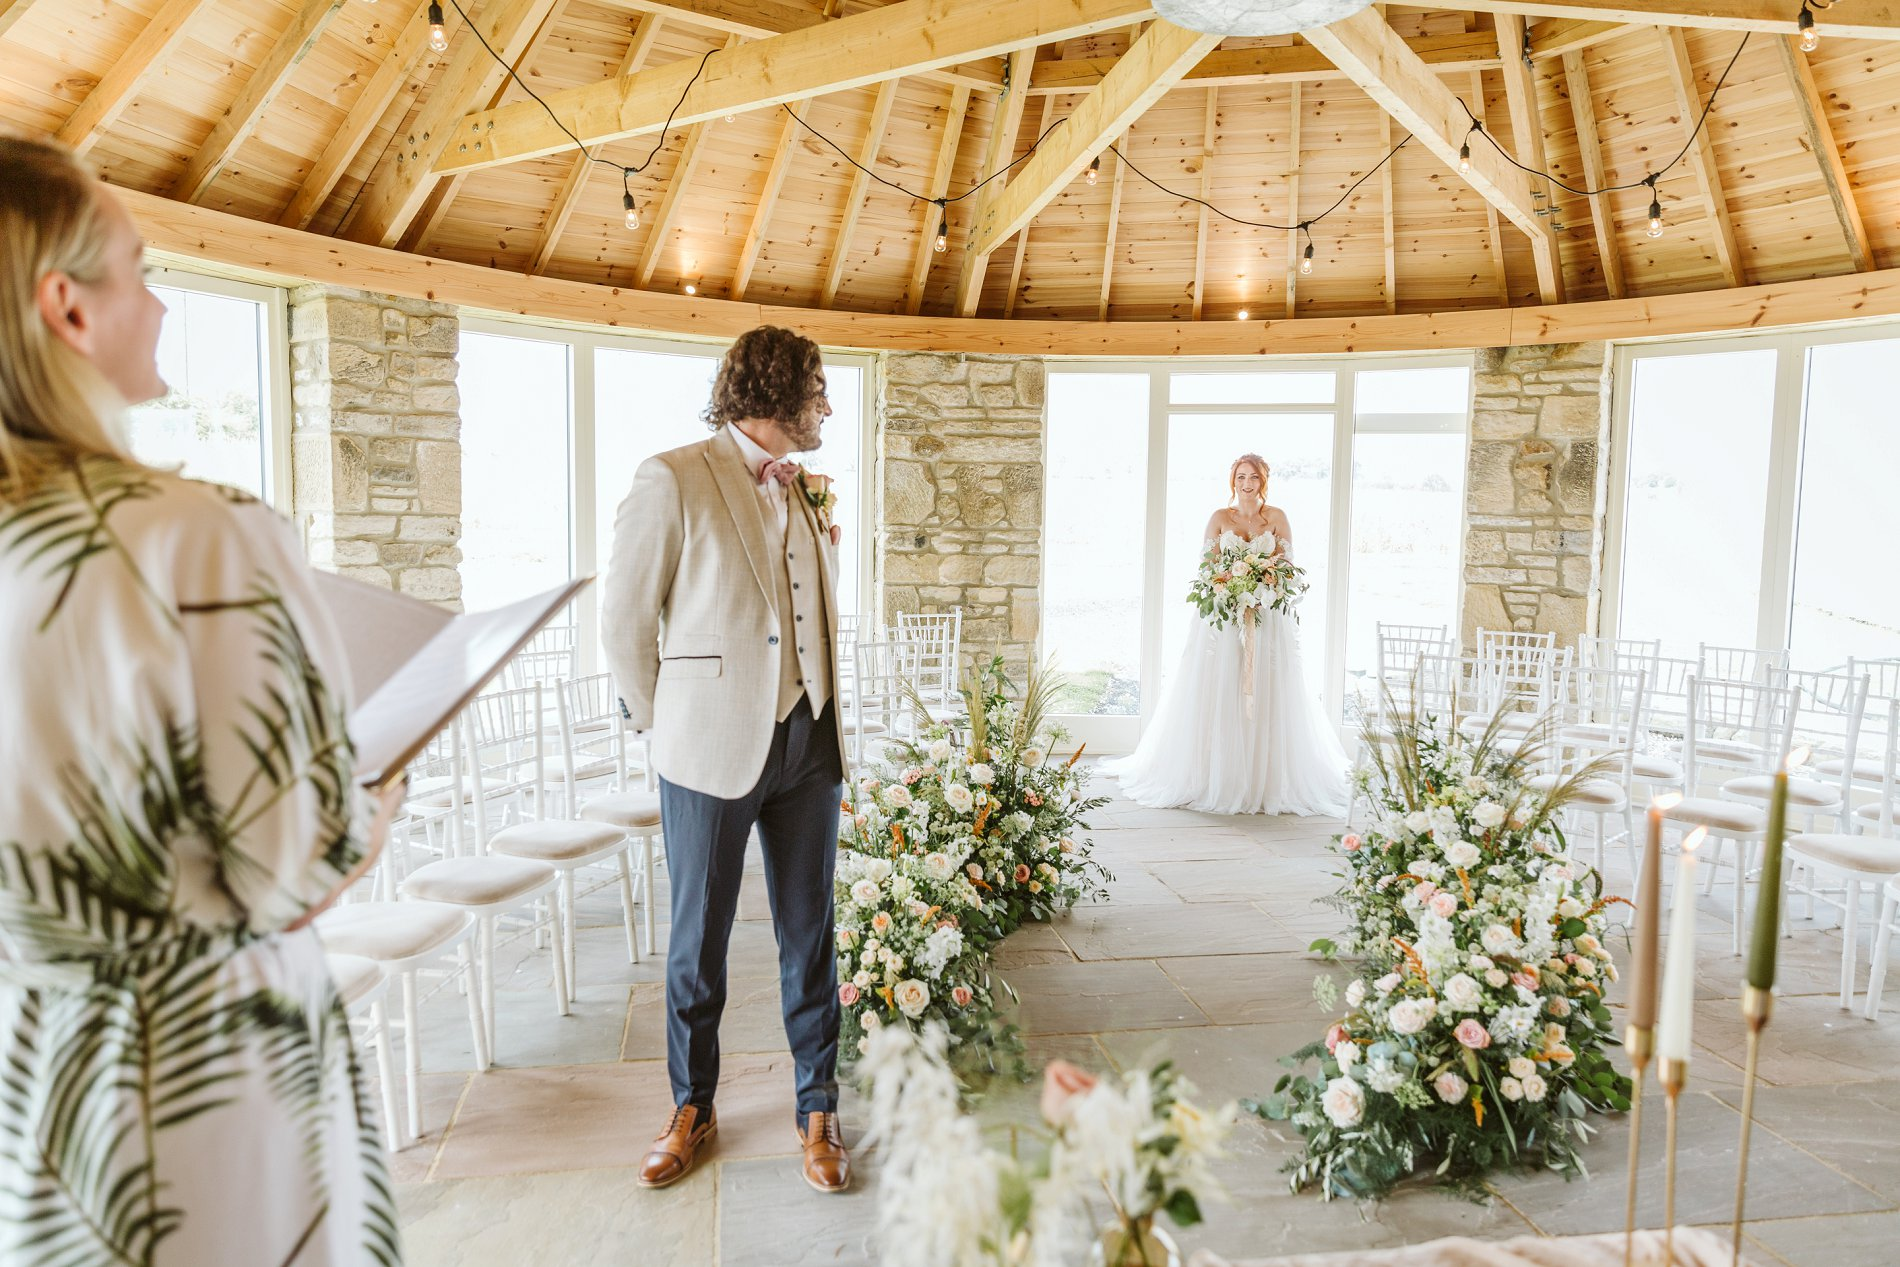 Saying I Do Rustic Wedding Creative Shoot (c) Charlotte Eve Photography (14)